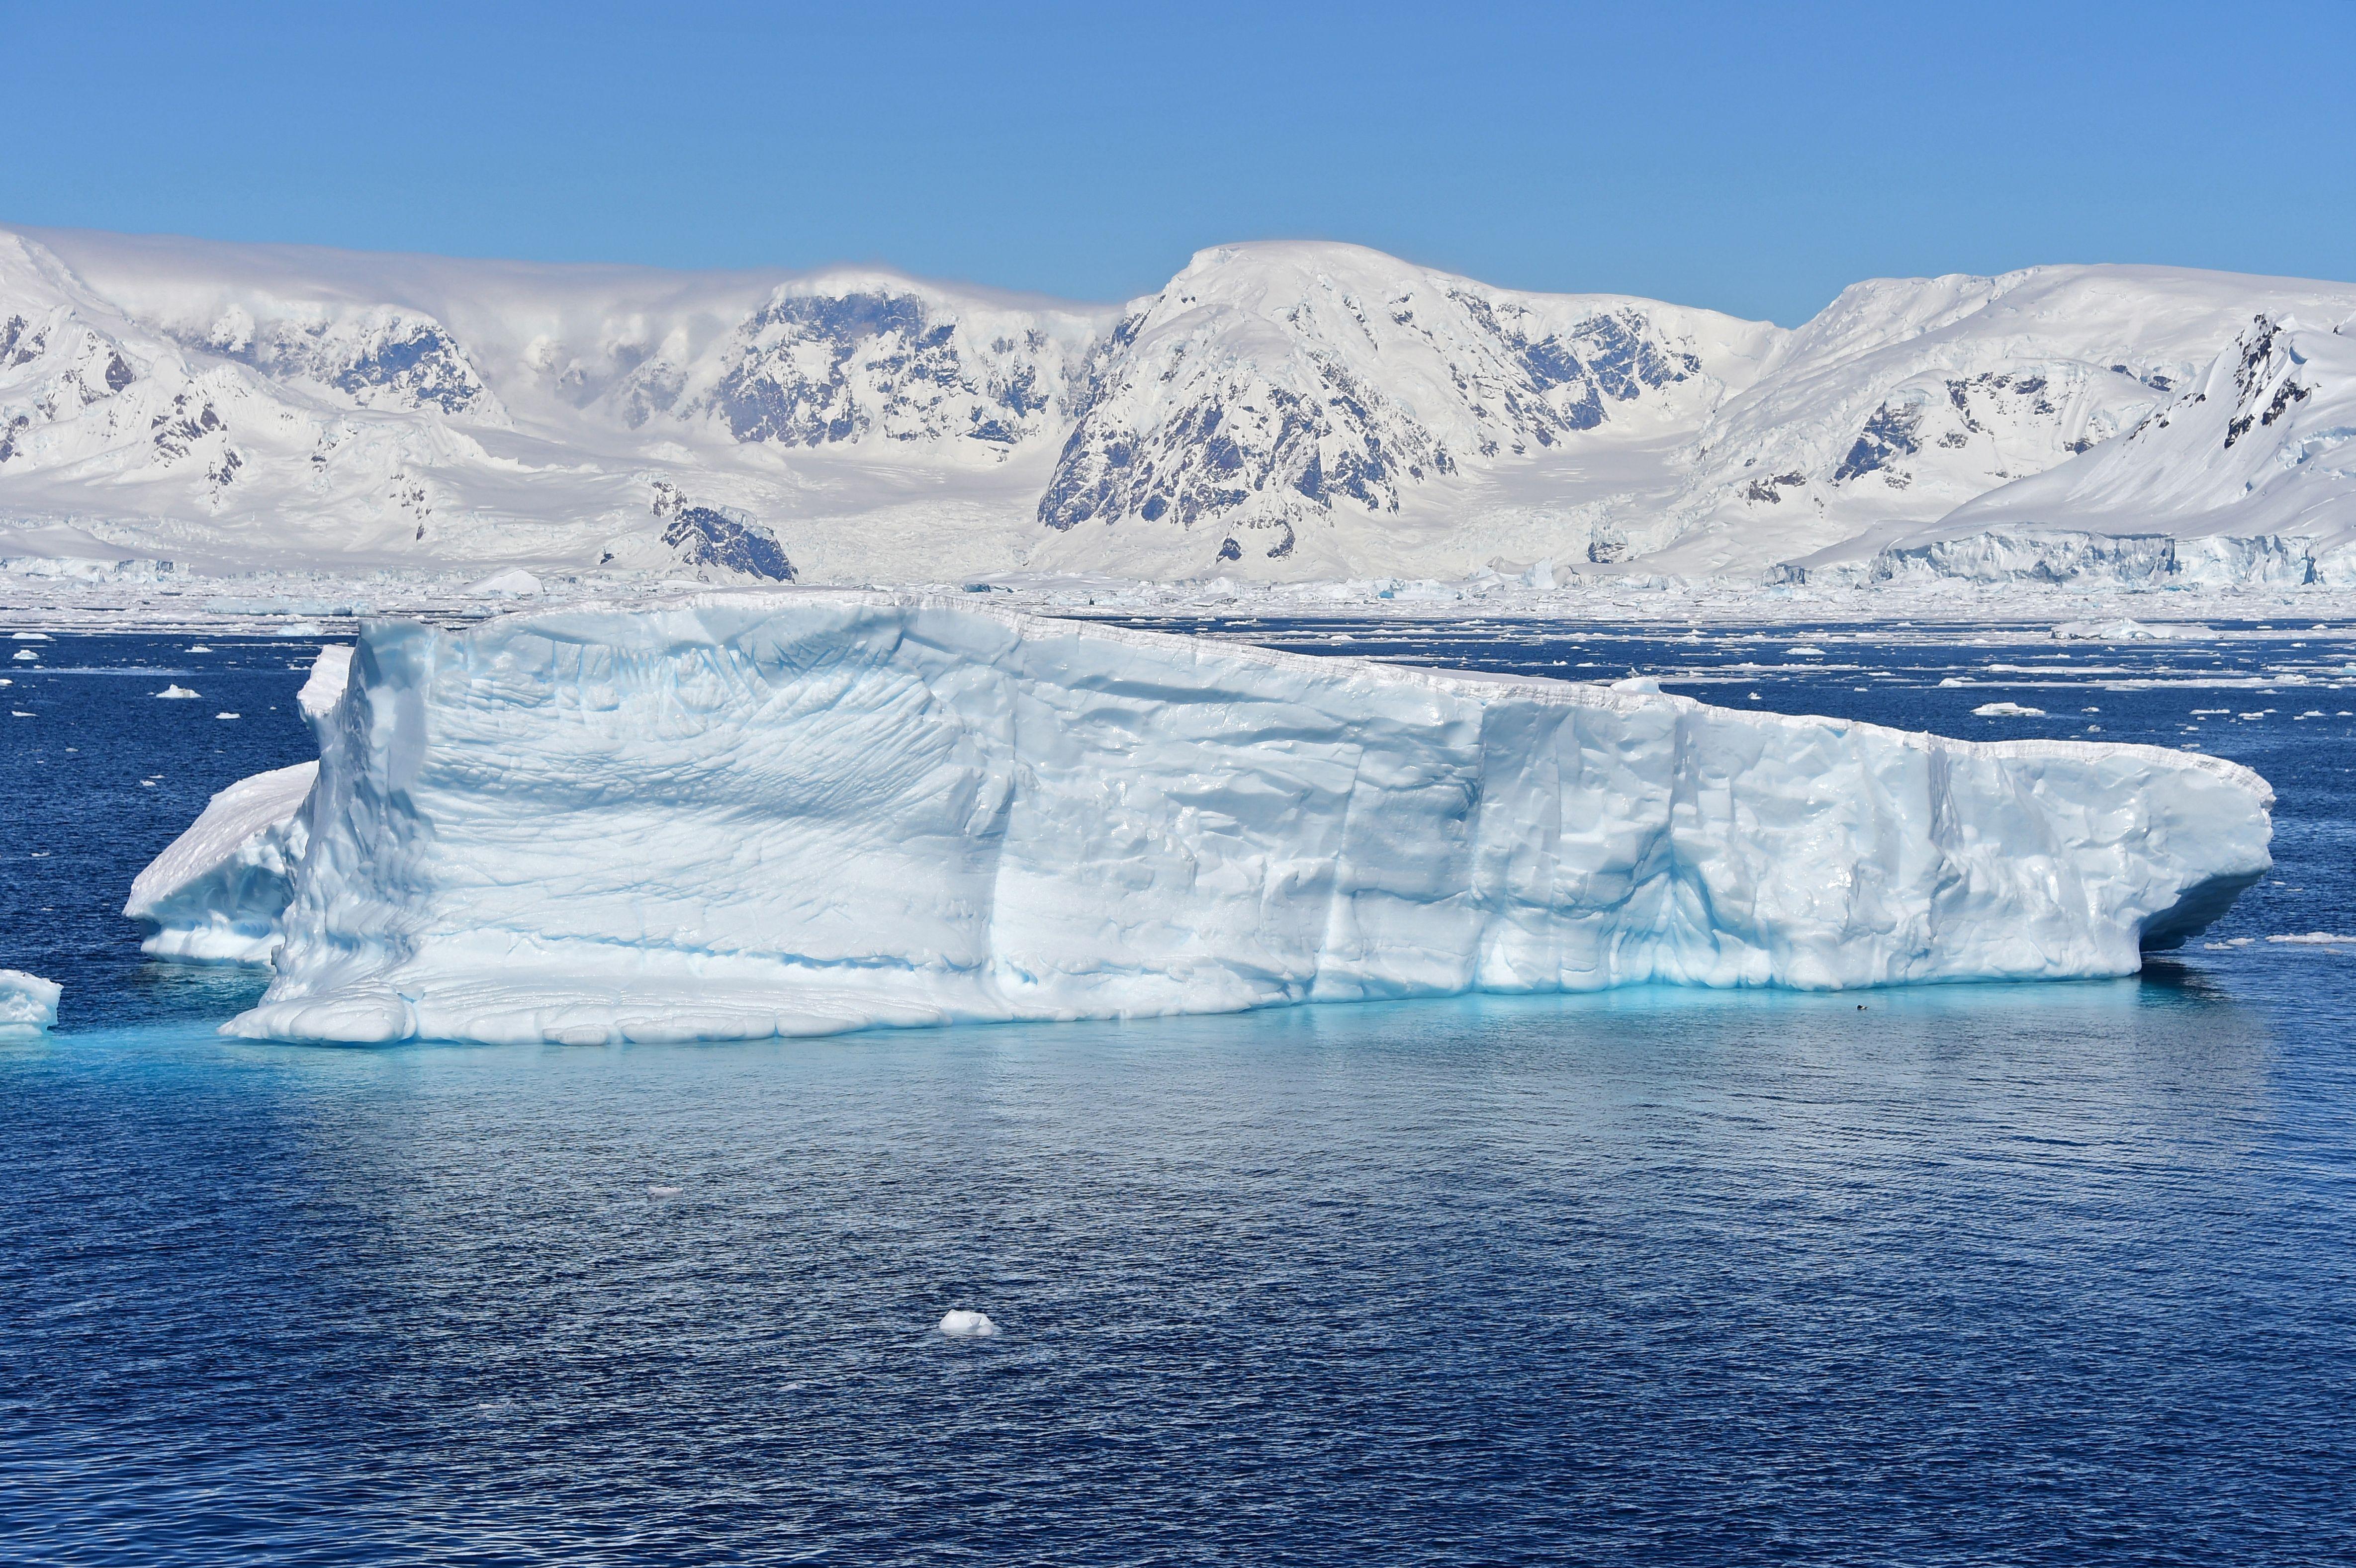 View of a glacier at Chiriguano Bay in South Shetland Islands, Antarctica, on November 7, 2019.